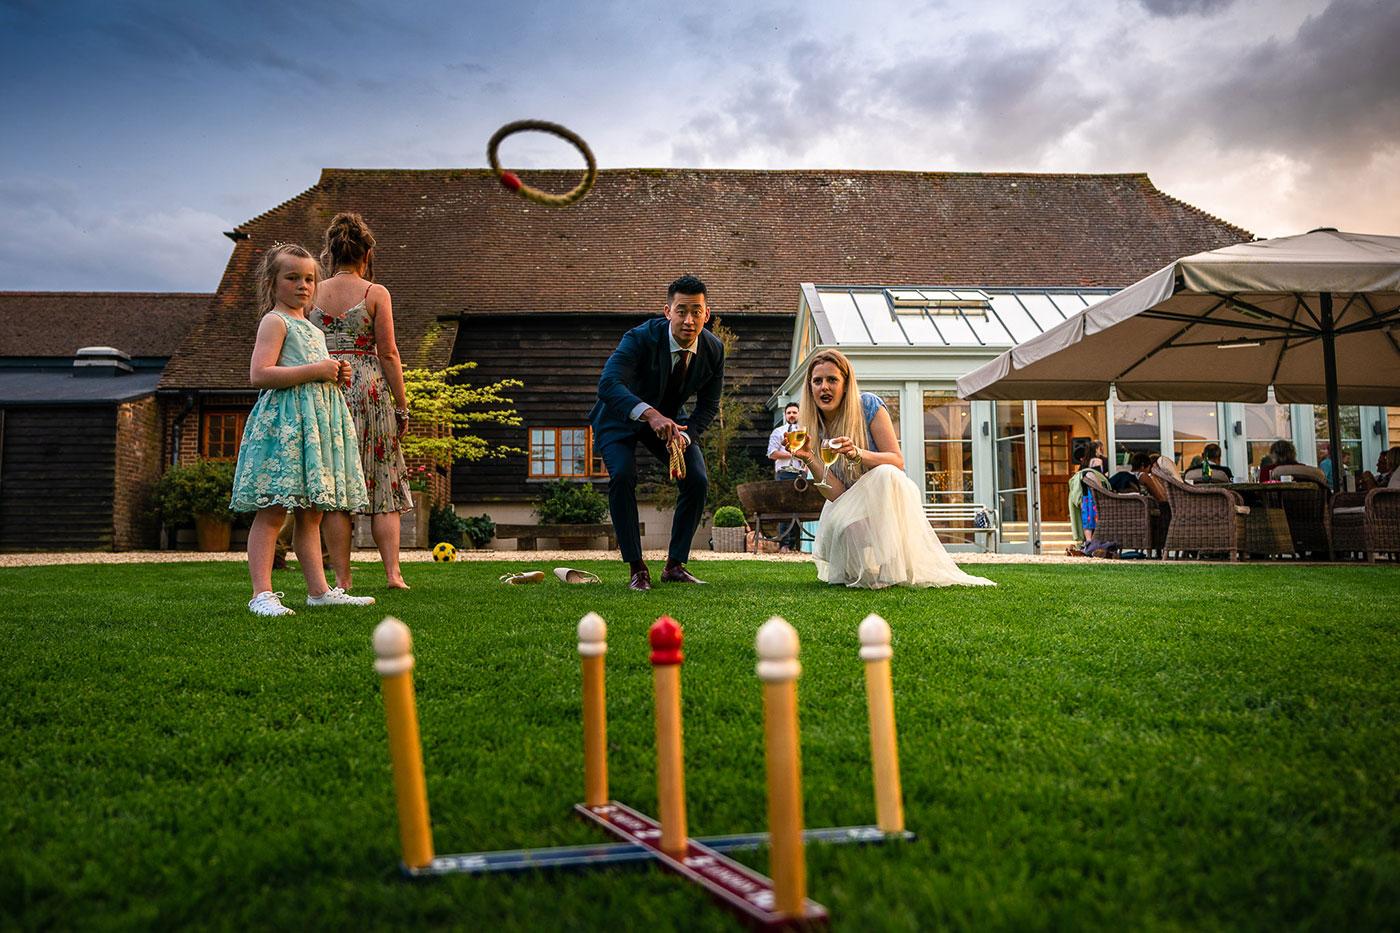 Wedding Carnival Games